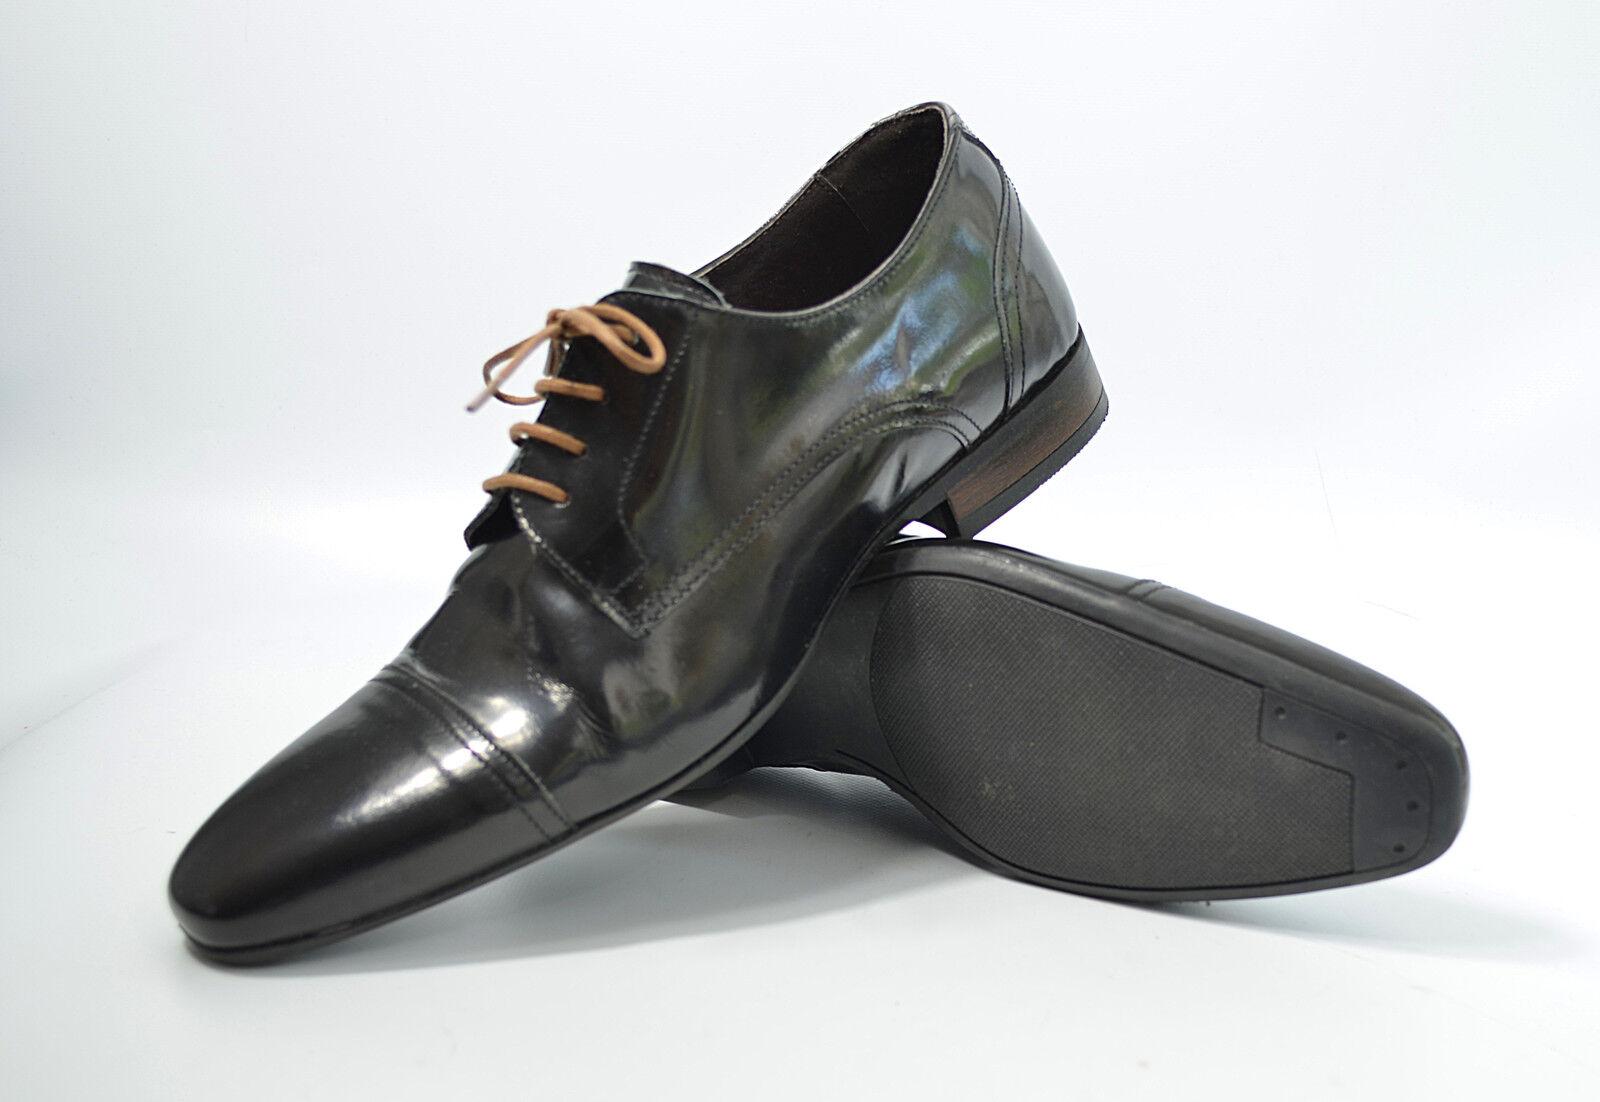 San Marina scarpe Pelle, basse Serapo MIS. 41 Pelle, scarpe UVP  Scarpe da uomo (v1) 05/17 m3 c26938